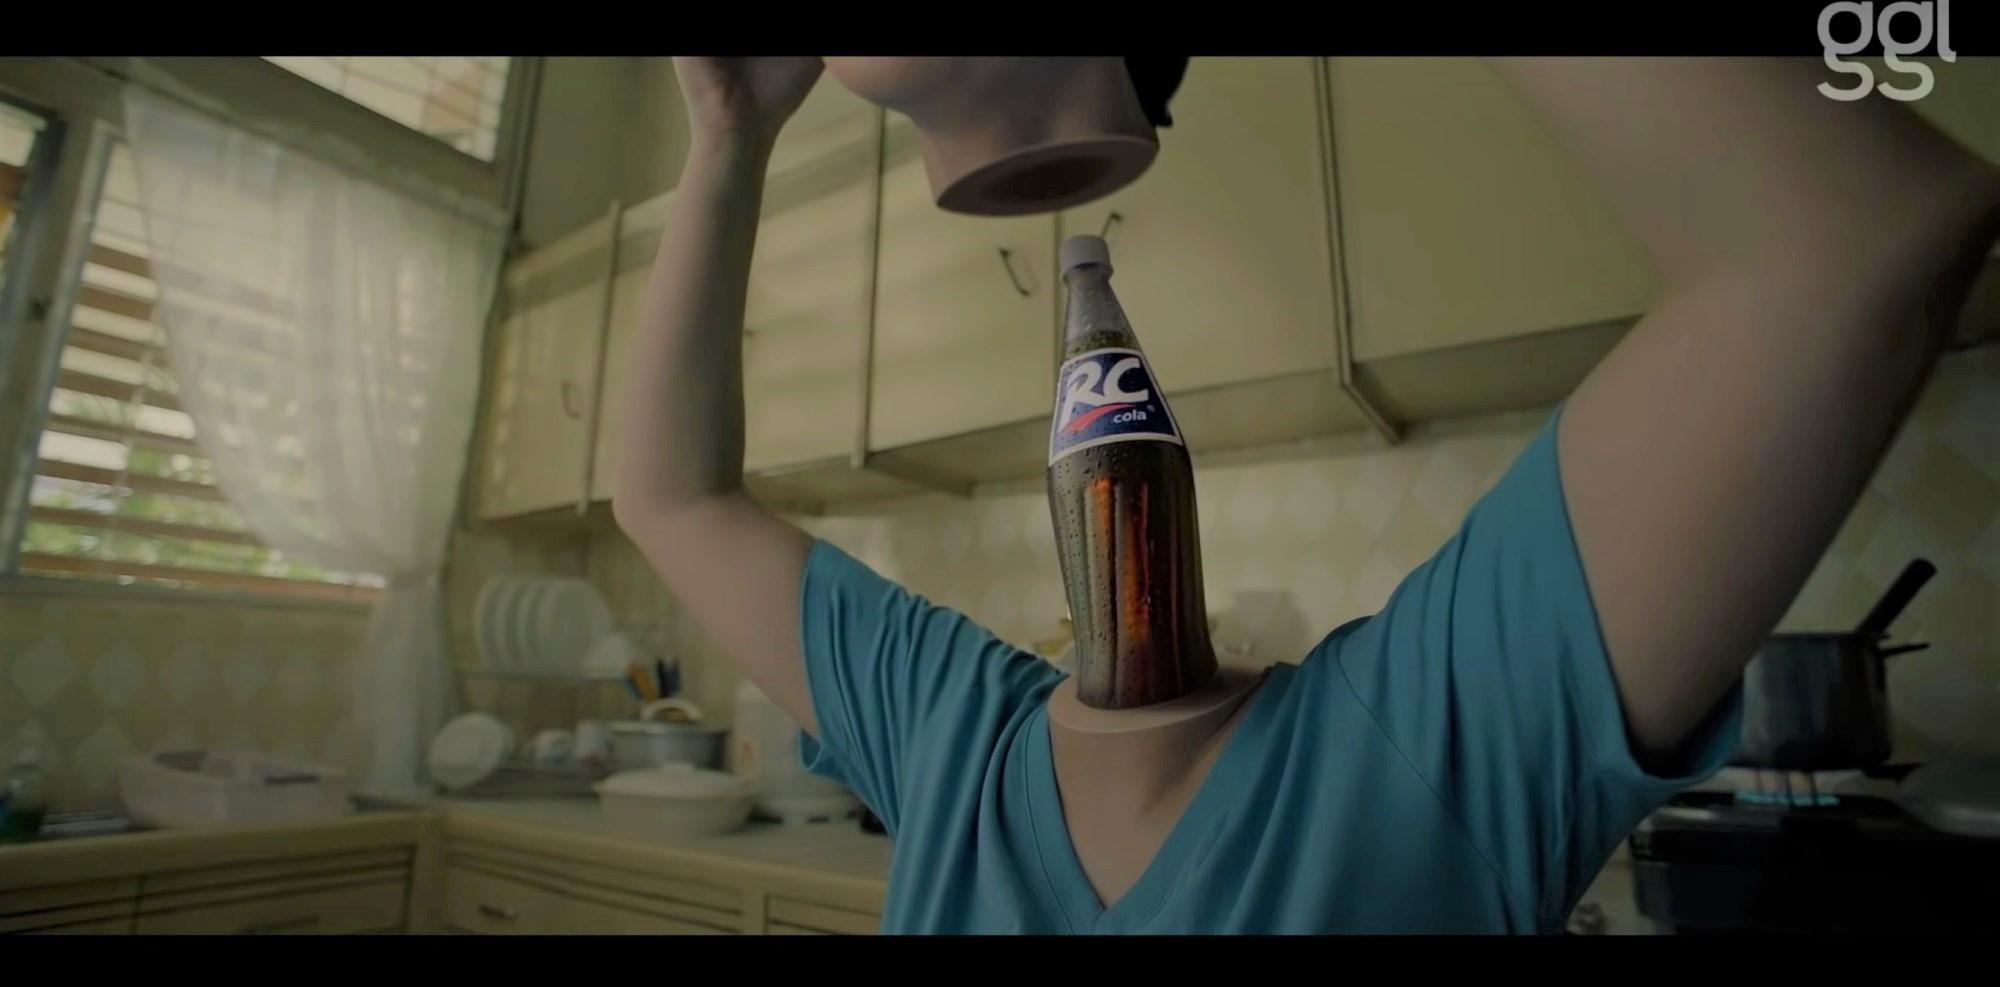 RC Cola ad winsCannes Lions award